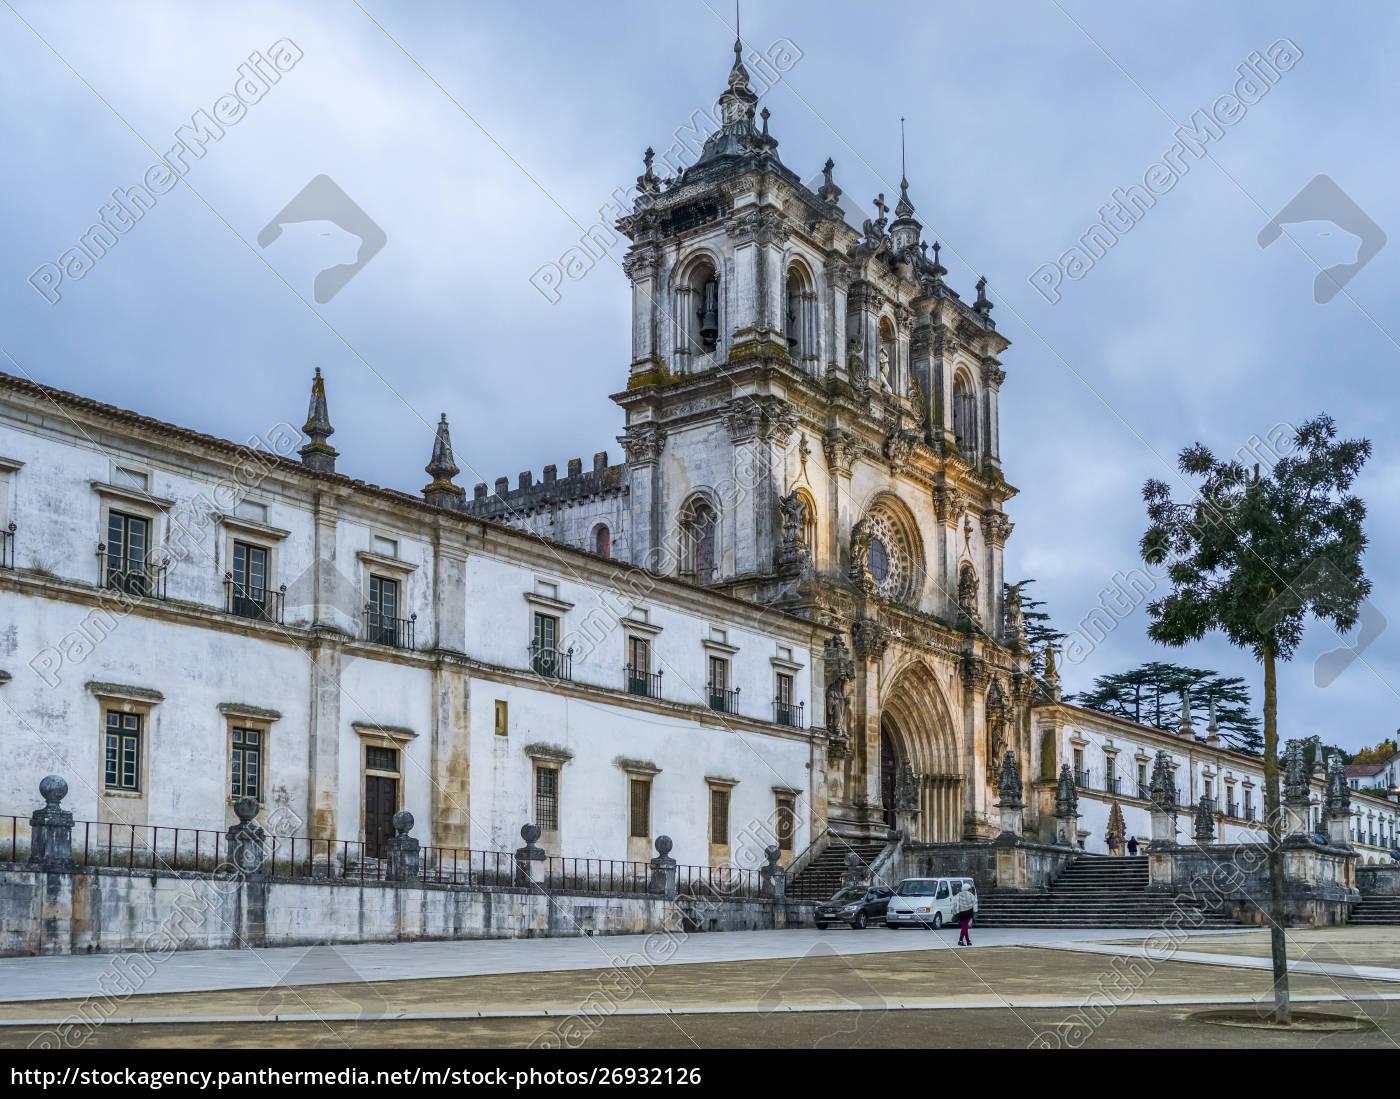 das, kloster, alcobaça;, portugal - 26932126